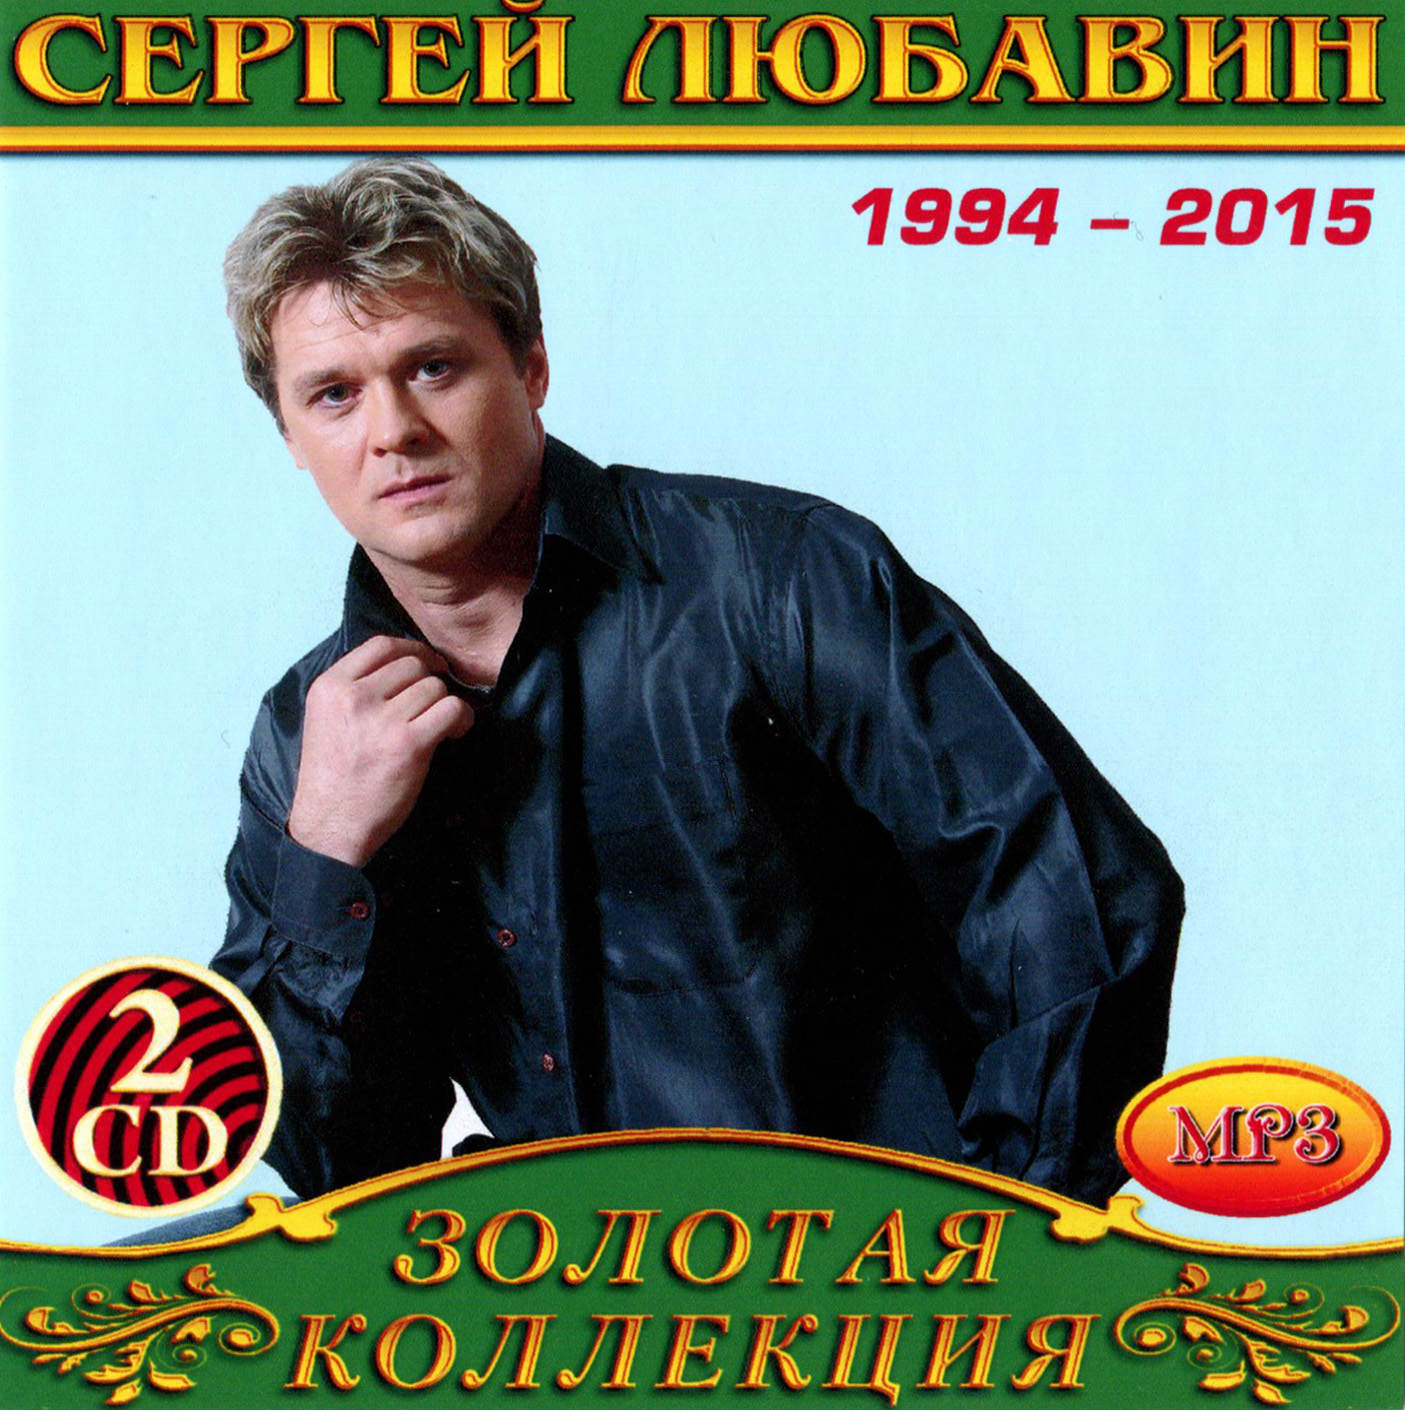 Сергей Любавин 2cd [mp3]